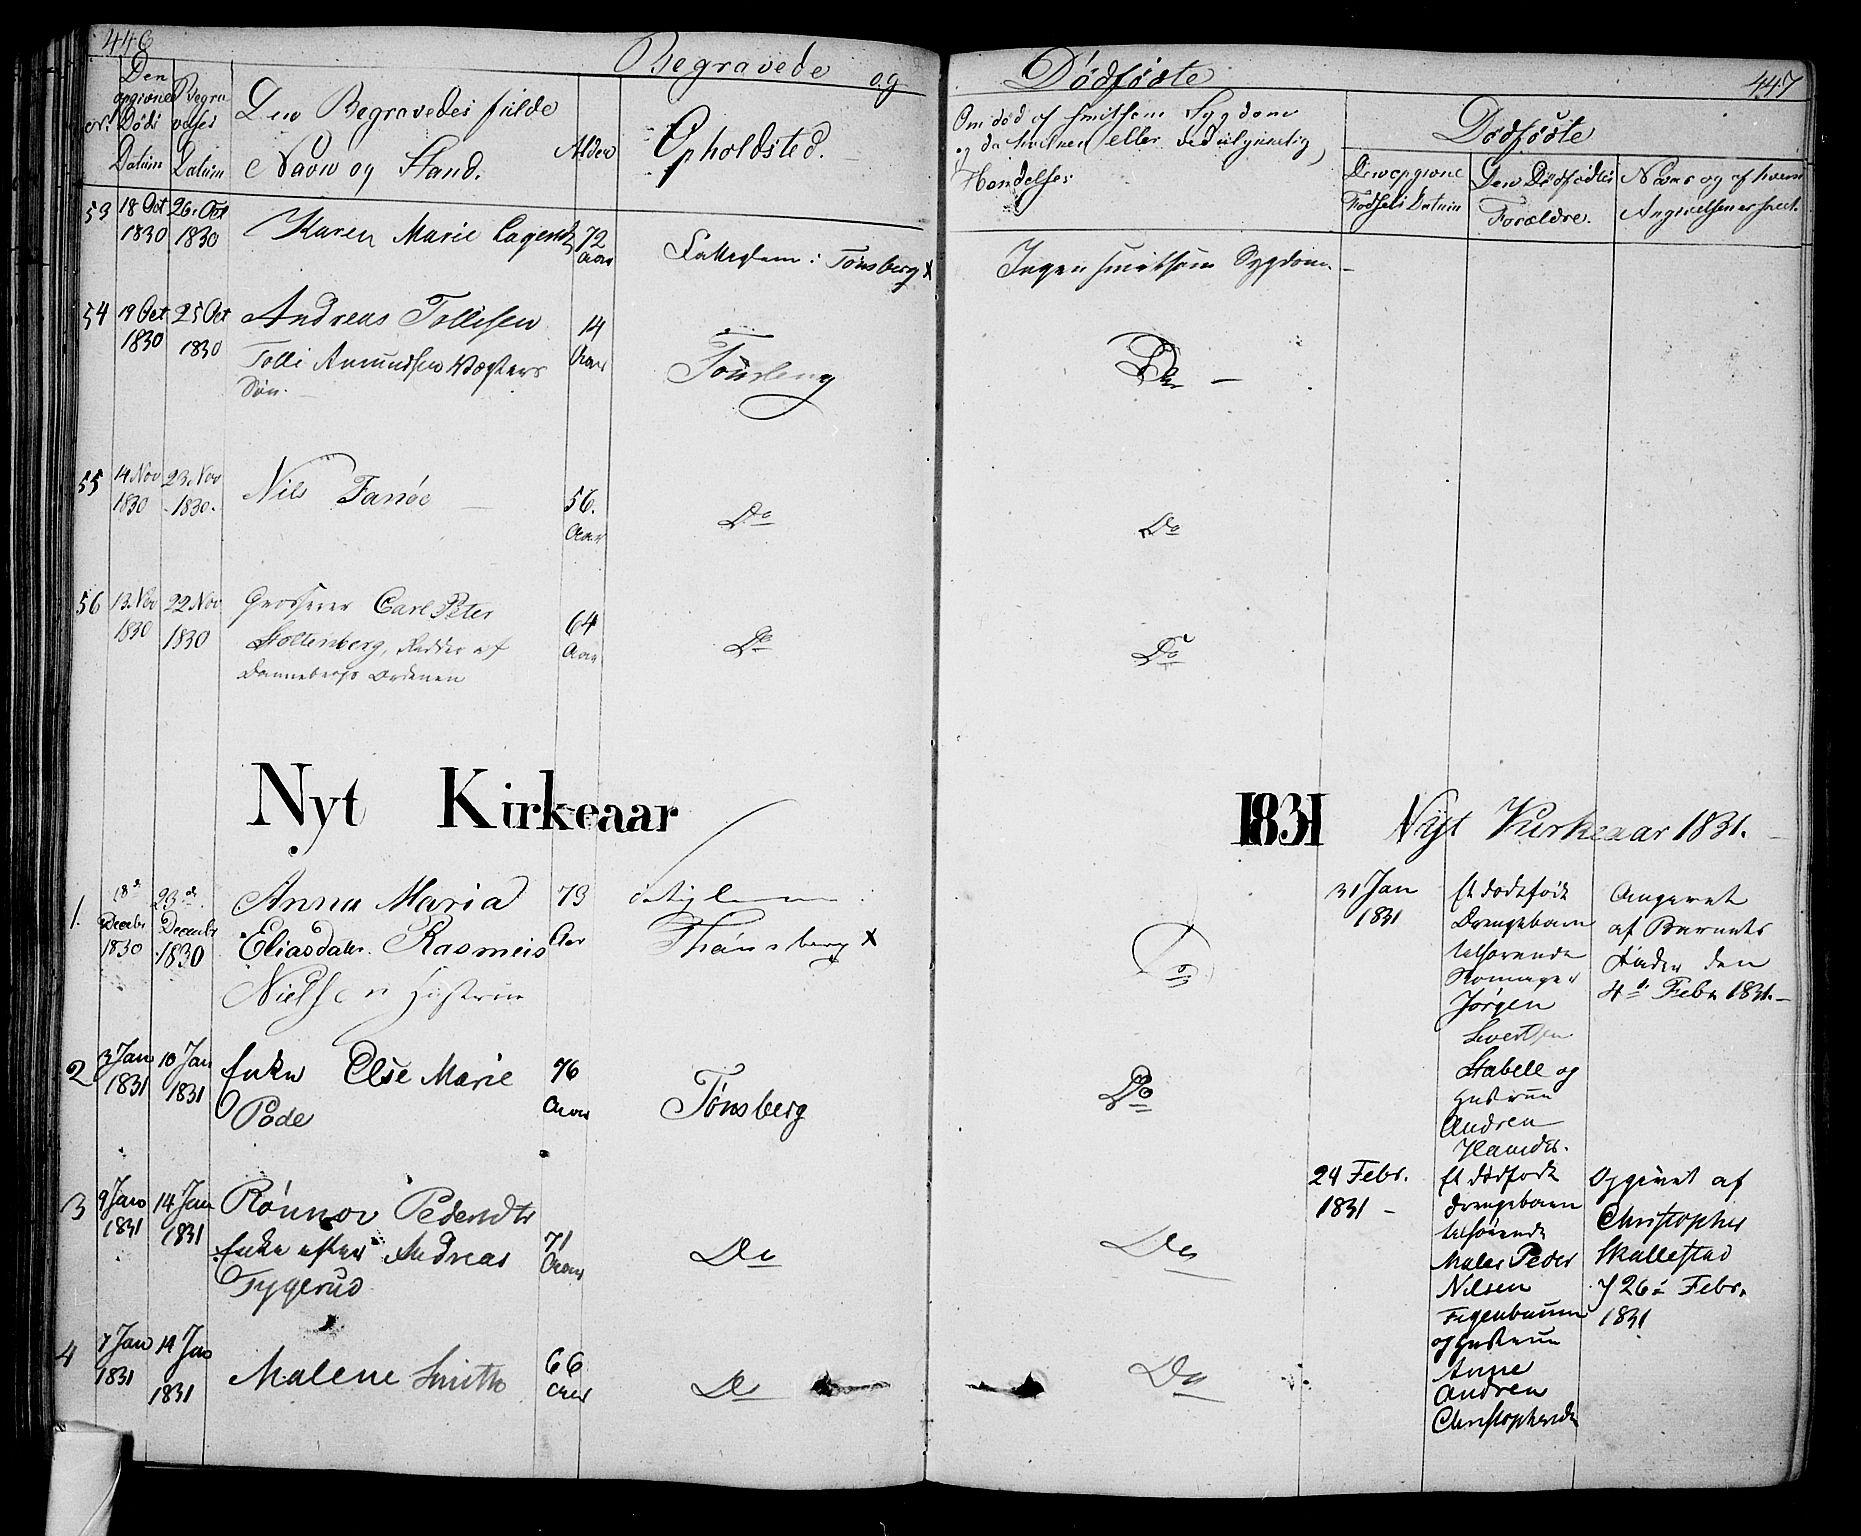 SAKO, Tønsberg kirkebøker, F/Fa/L0005: Ministerialbok nr. I 5, 1827-1836, s. 446-447